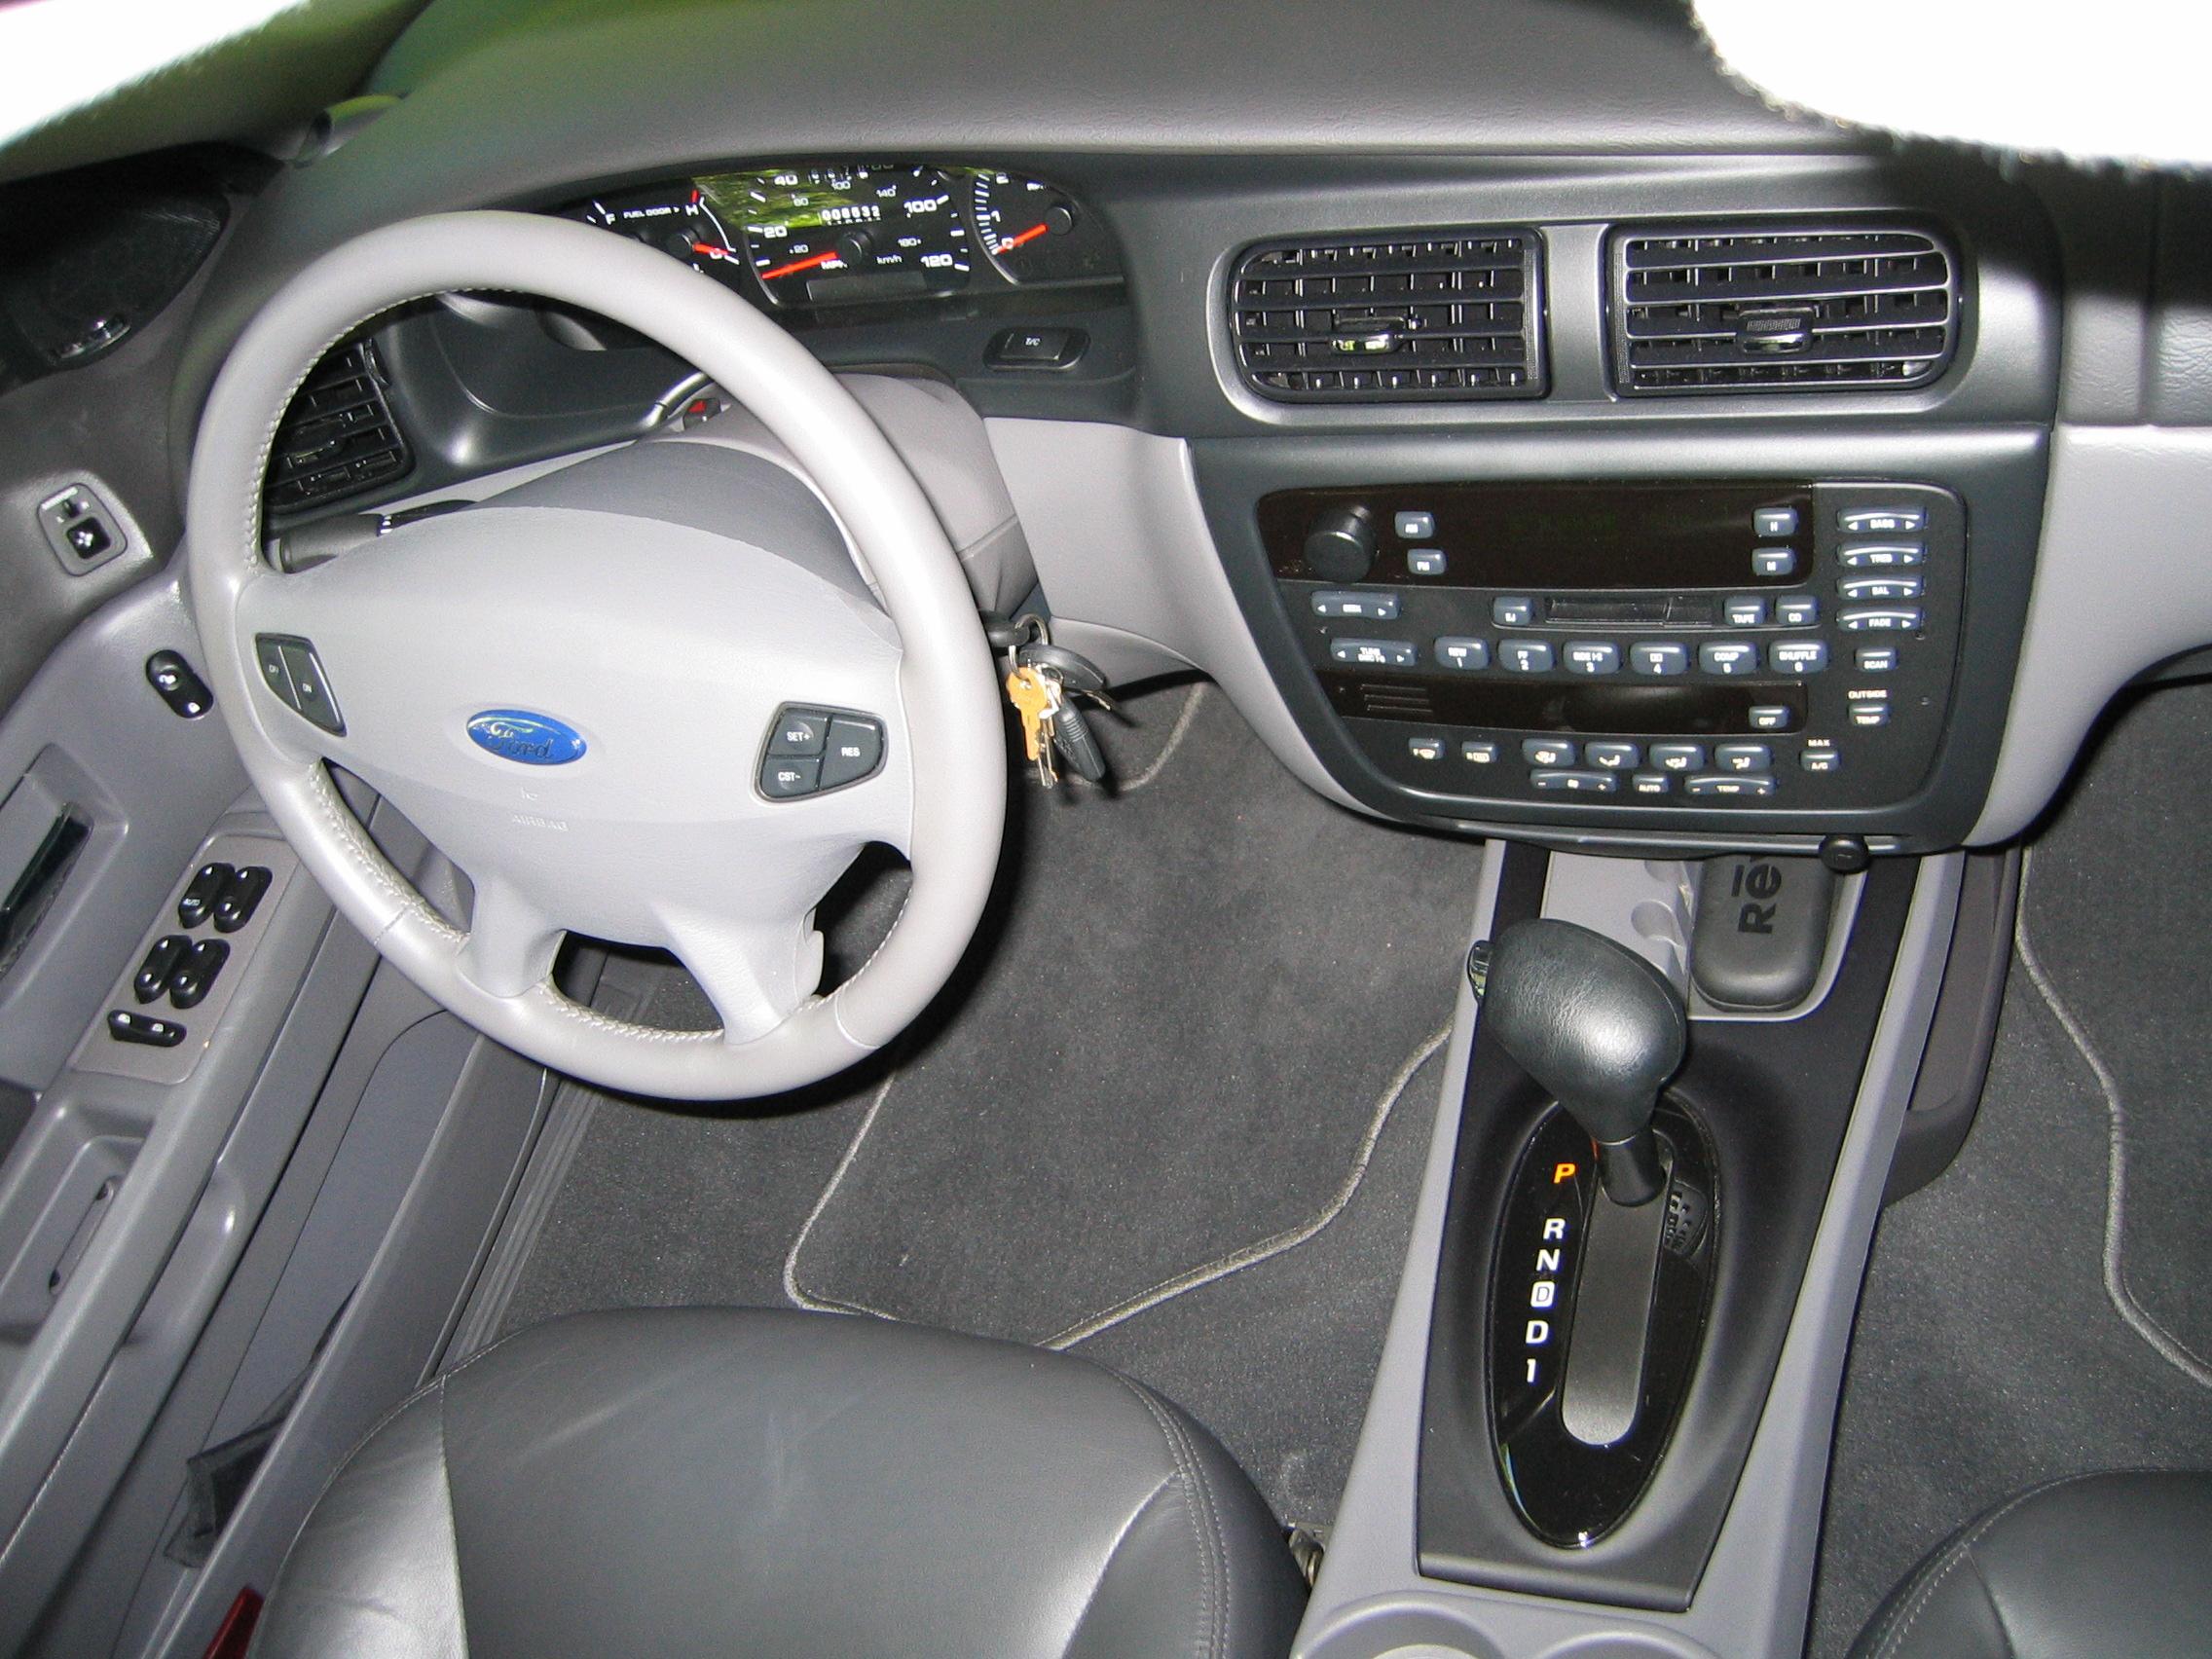 2002 ford taurus image 20